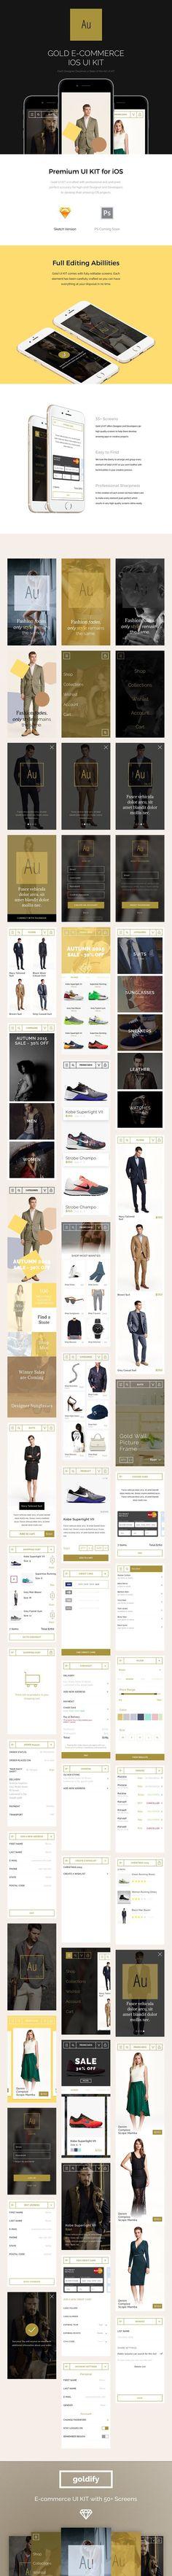 Goldify e-Commerce iOS UI Kit. UI Elements